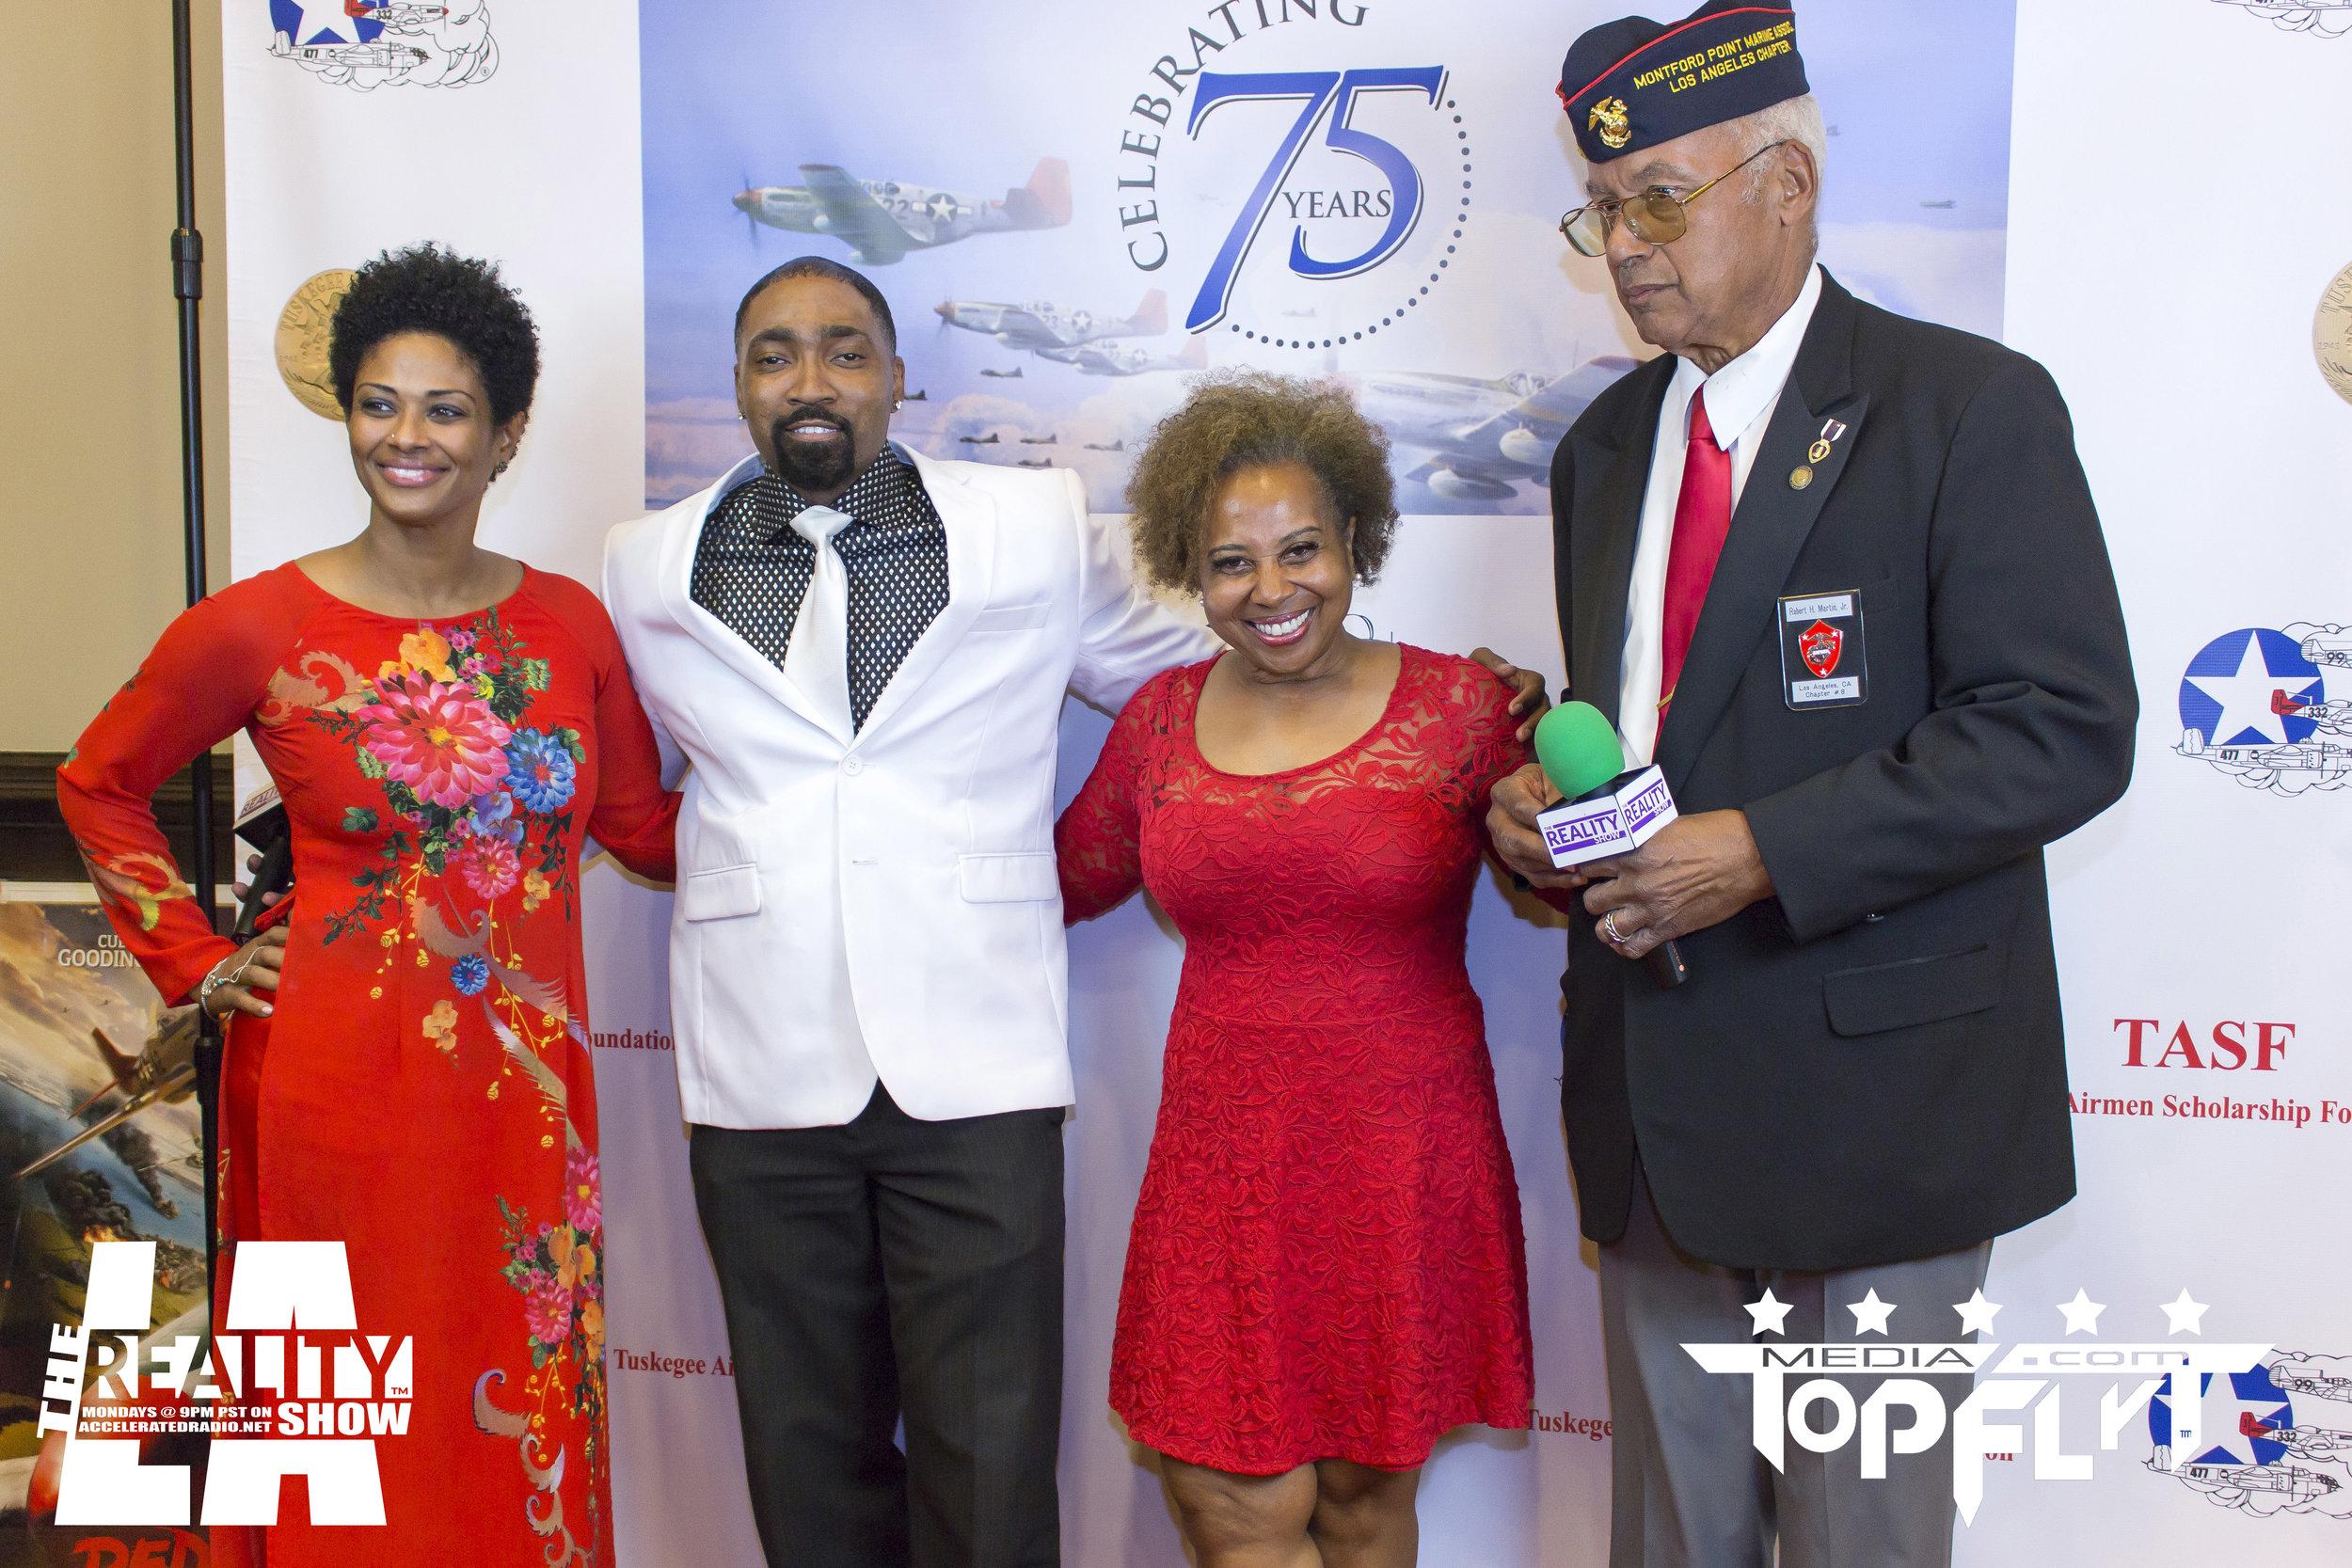 The Reality Show LA - Tuskegee Airmen 75th Anniversary VIP Reception_62.jpg